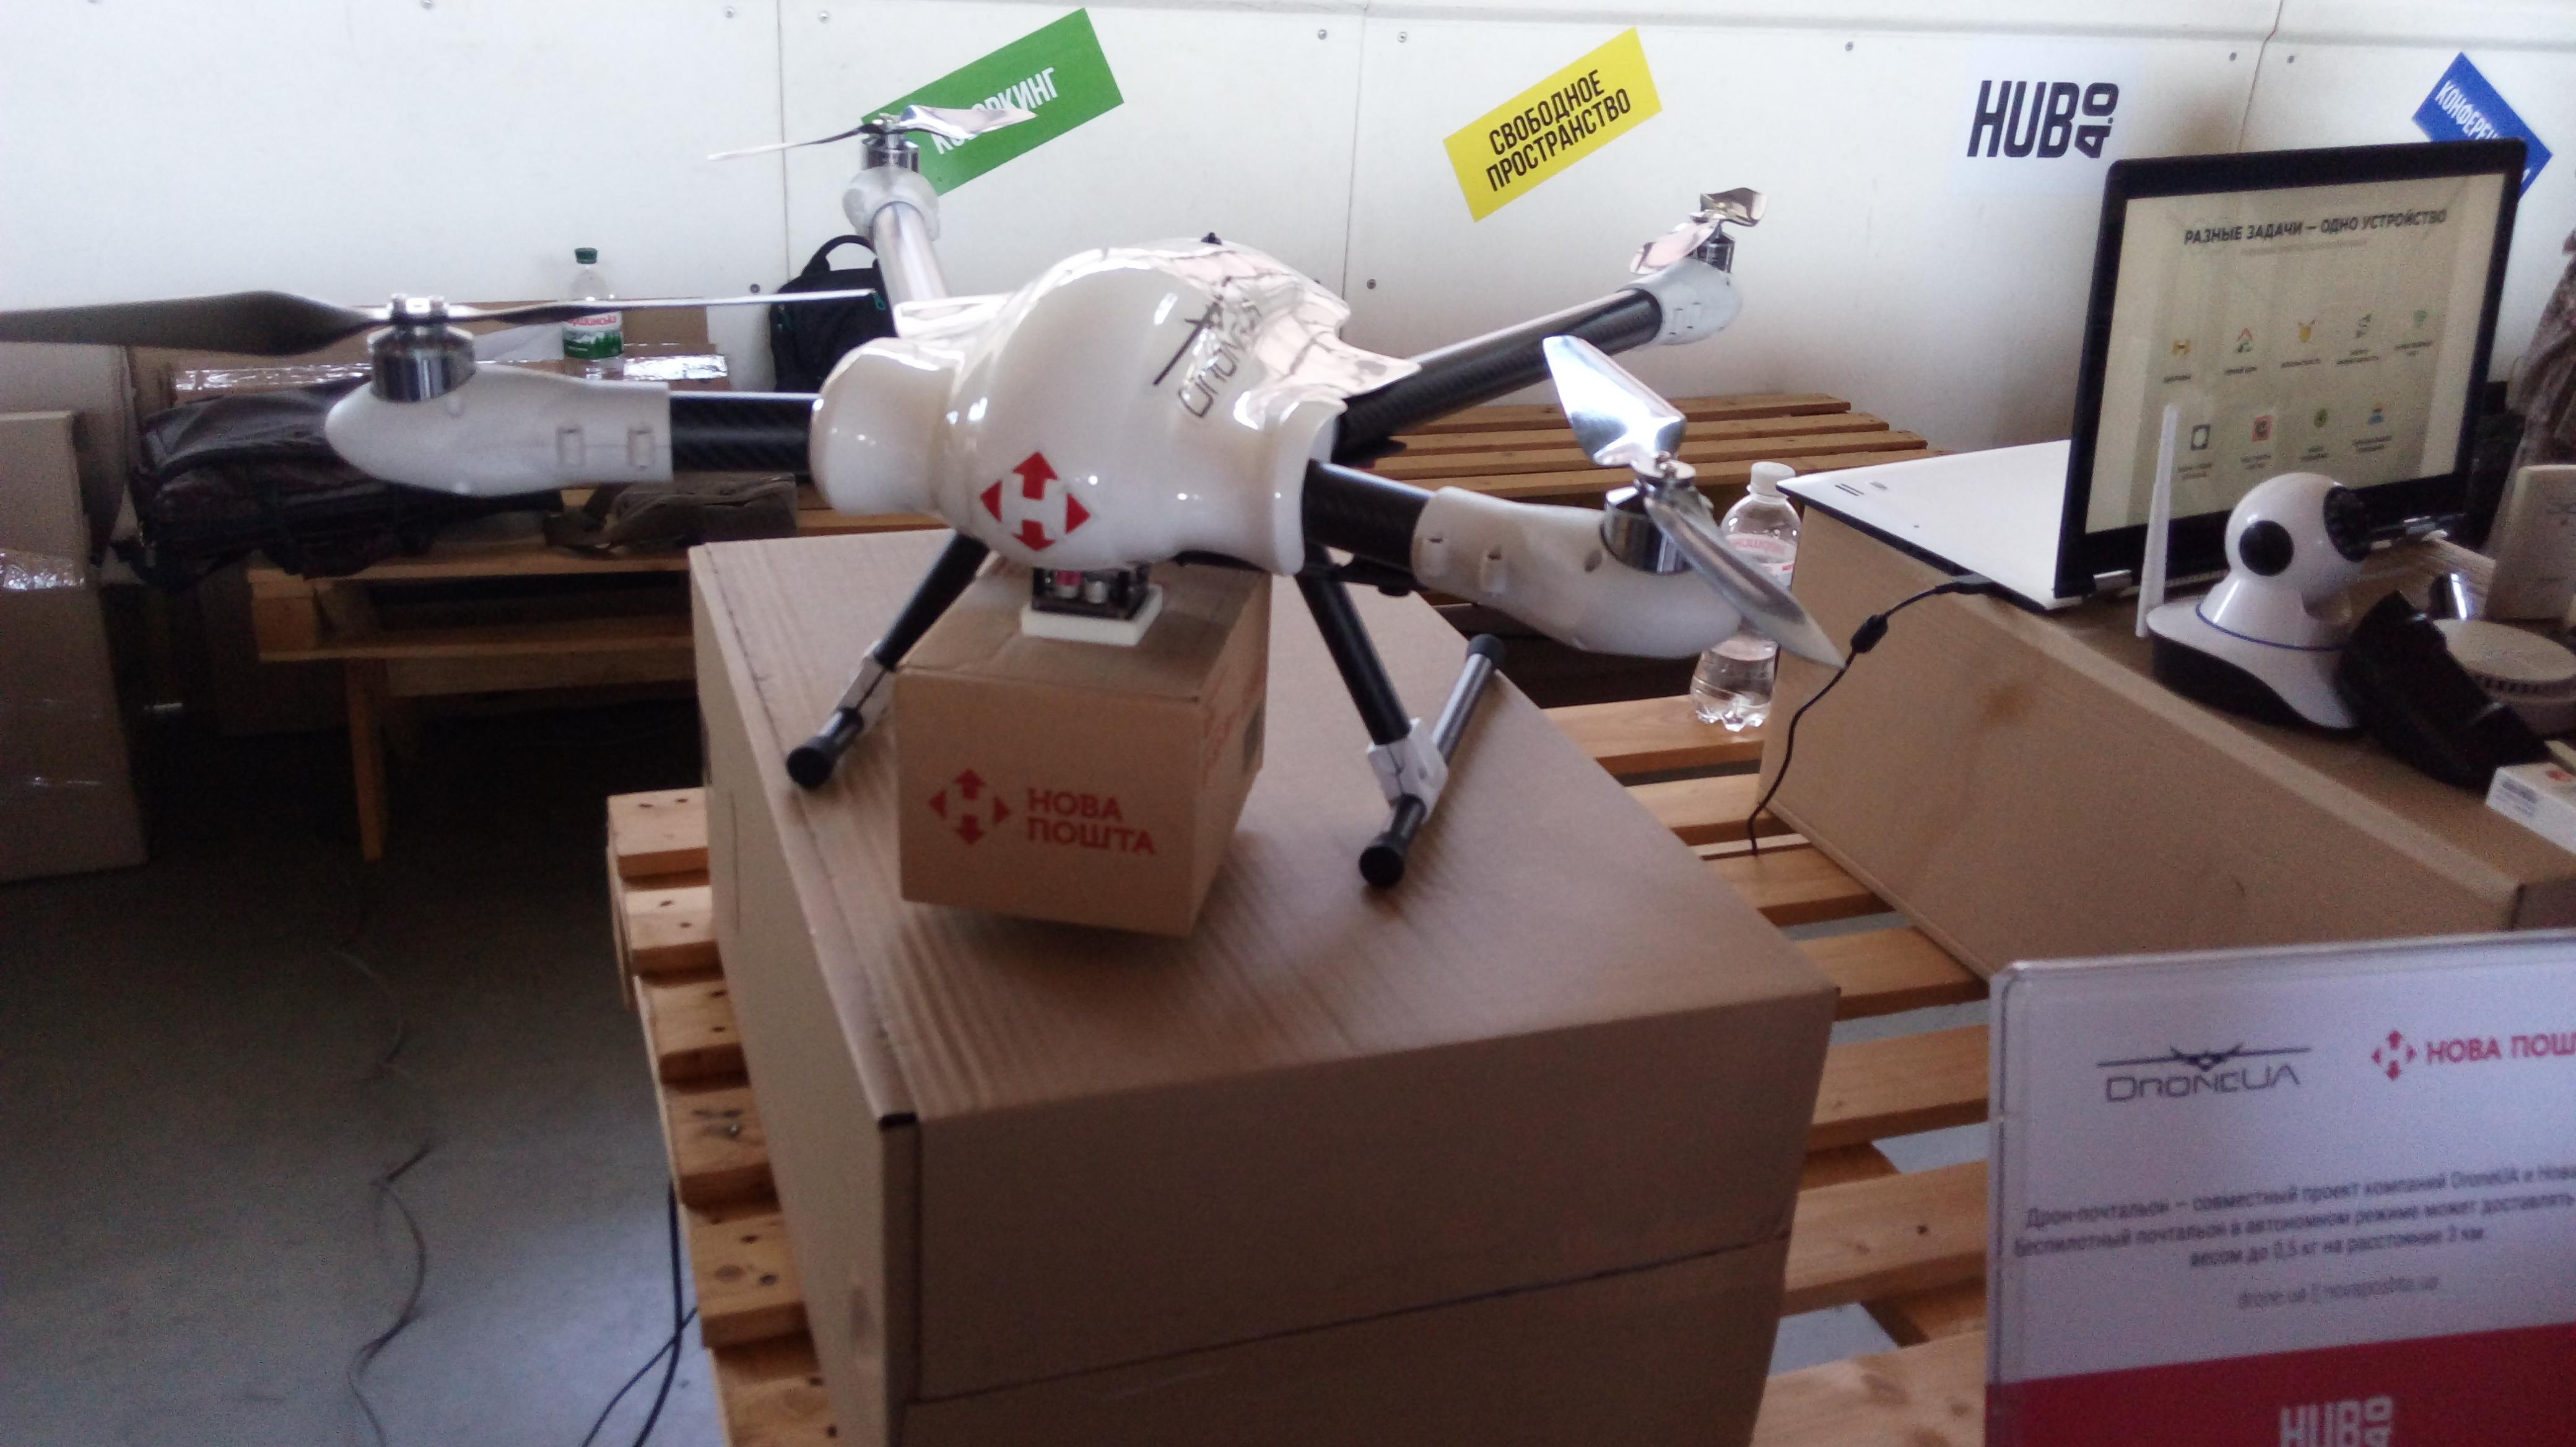 v-dnepre-proshel-festival-innovacionnykh-tekhnologijj-interpipe-techfest-dron-pochtalon